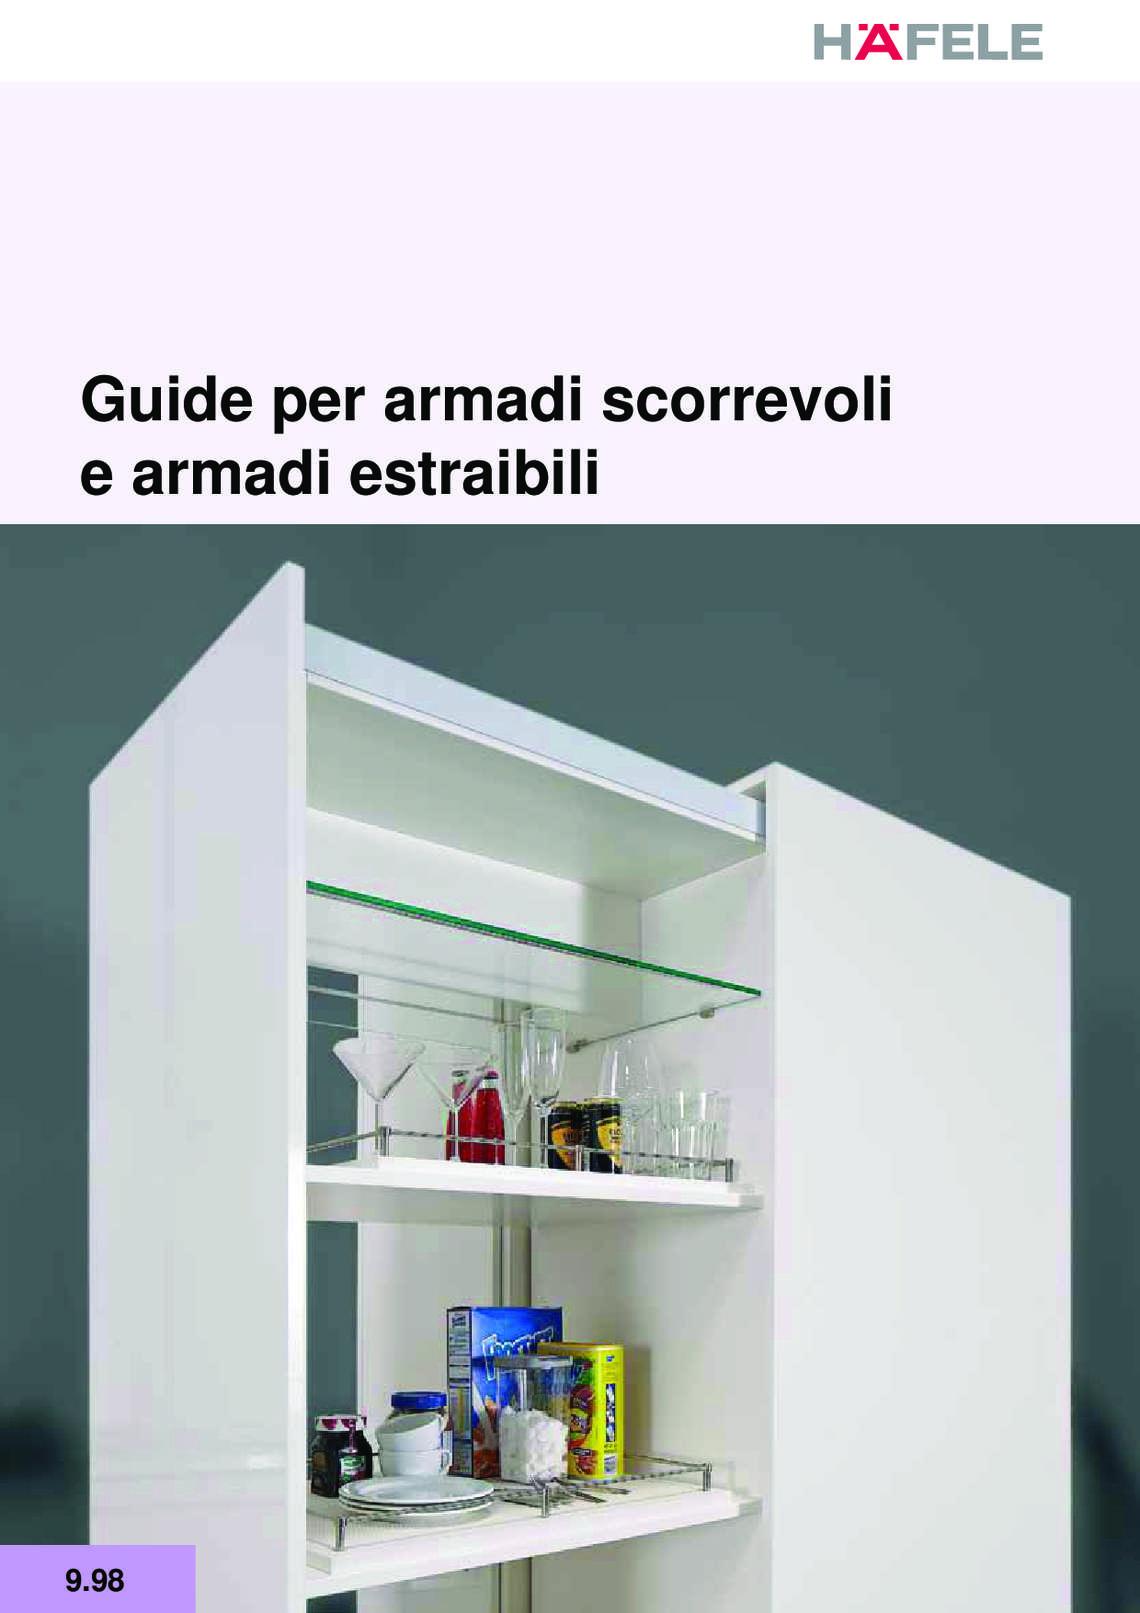 hafele-spondine-e-guide-per-mobili_40_145.jpg